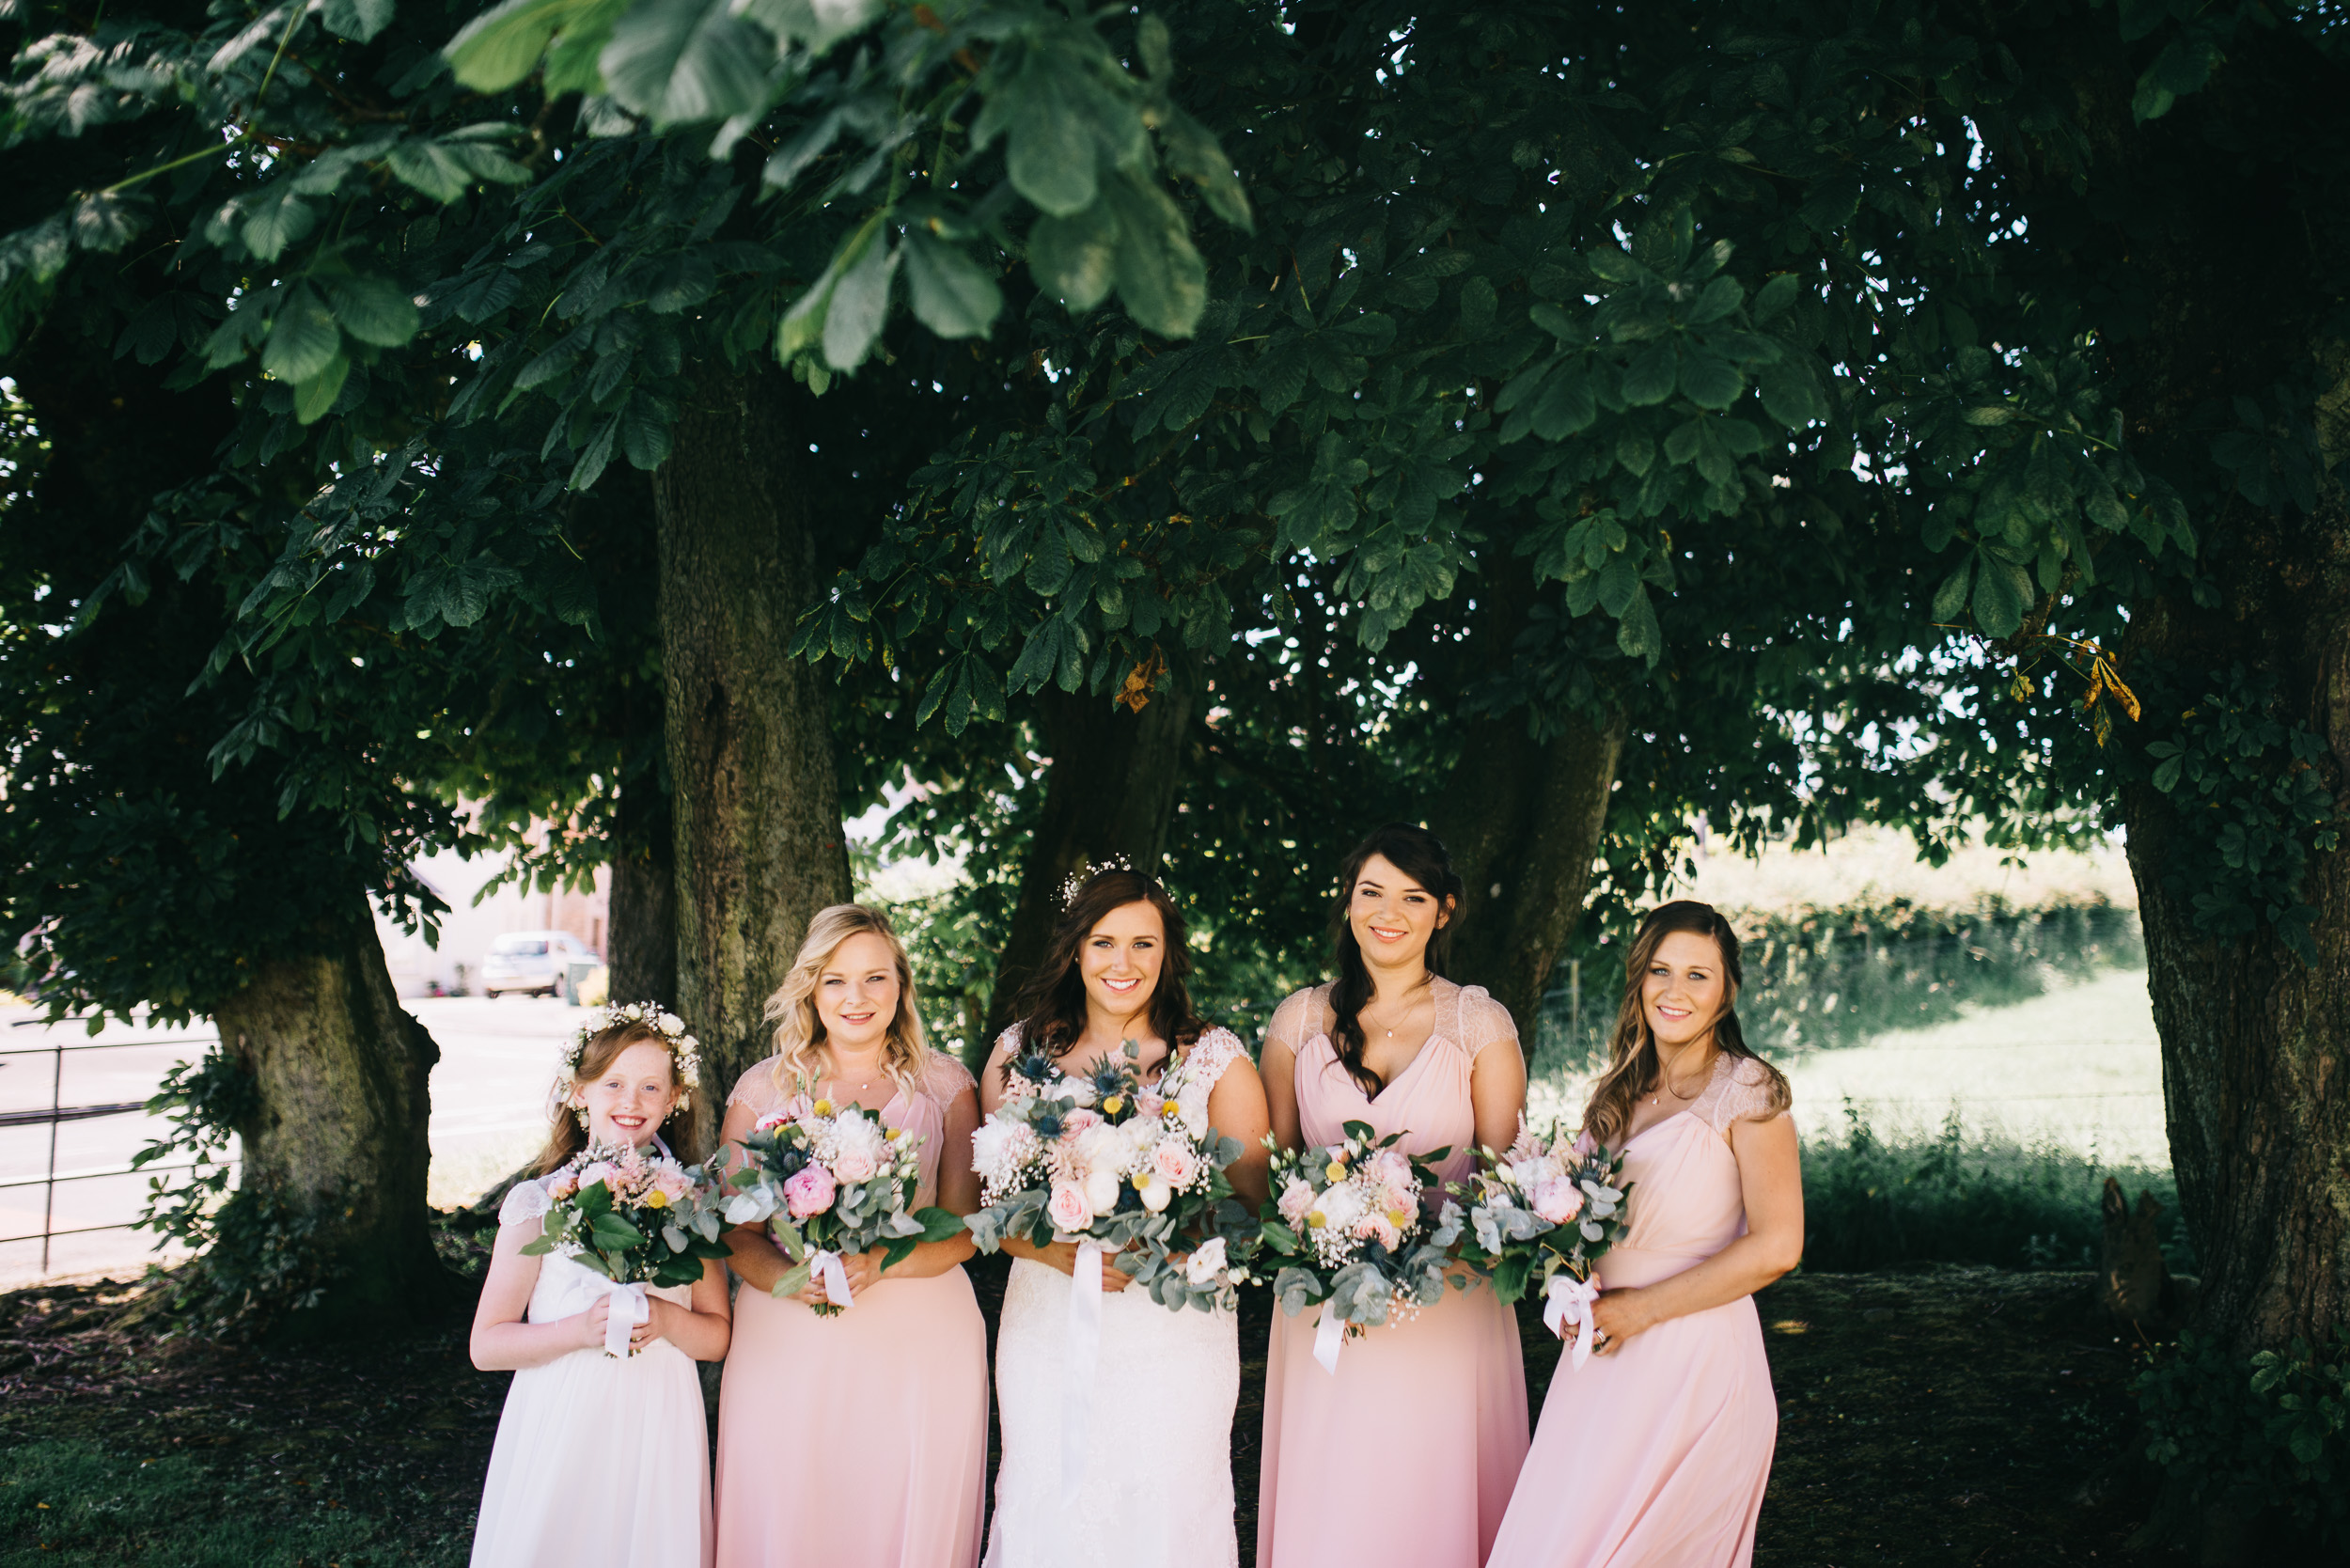 wedding photogaphy peter mackey 2018 beth-3.jpg